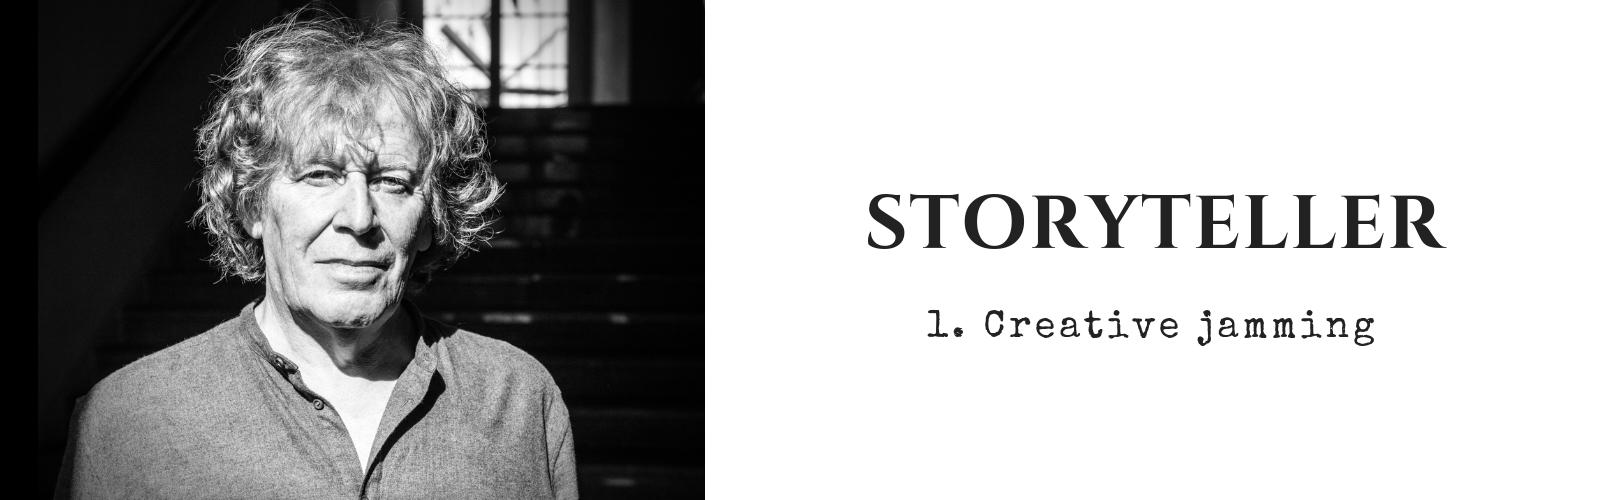 Pat Mills Storyteller #1 Creative jamming photo by Richard Klicnik